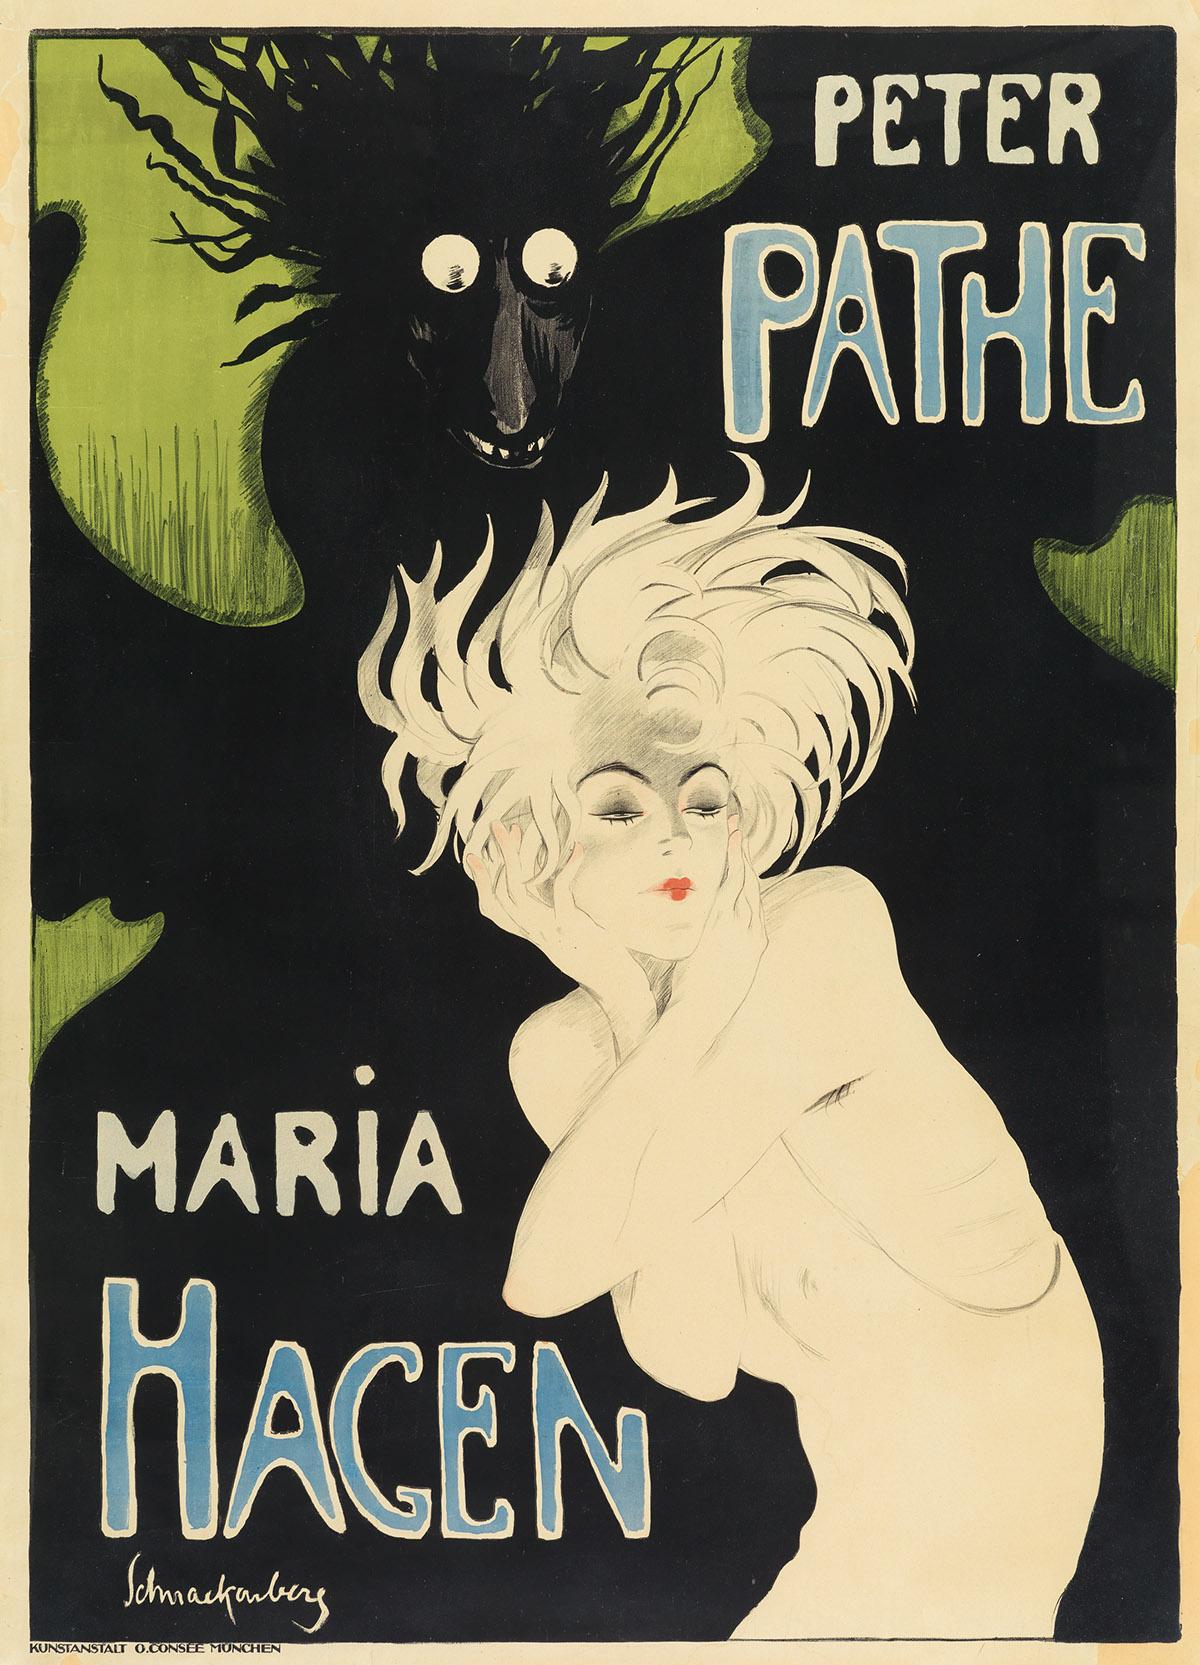 WALTER SCHNACKENBERG (1880-1961). PETER PATHE / MARIA HAGEN. Circa 1918. 48x35 inches, 122x89 cm. O. Consée, Munich.